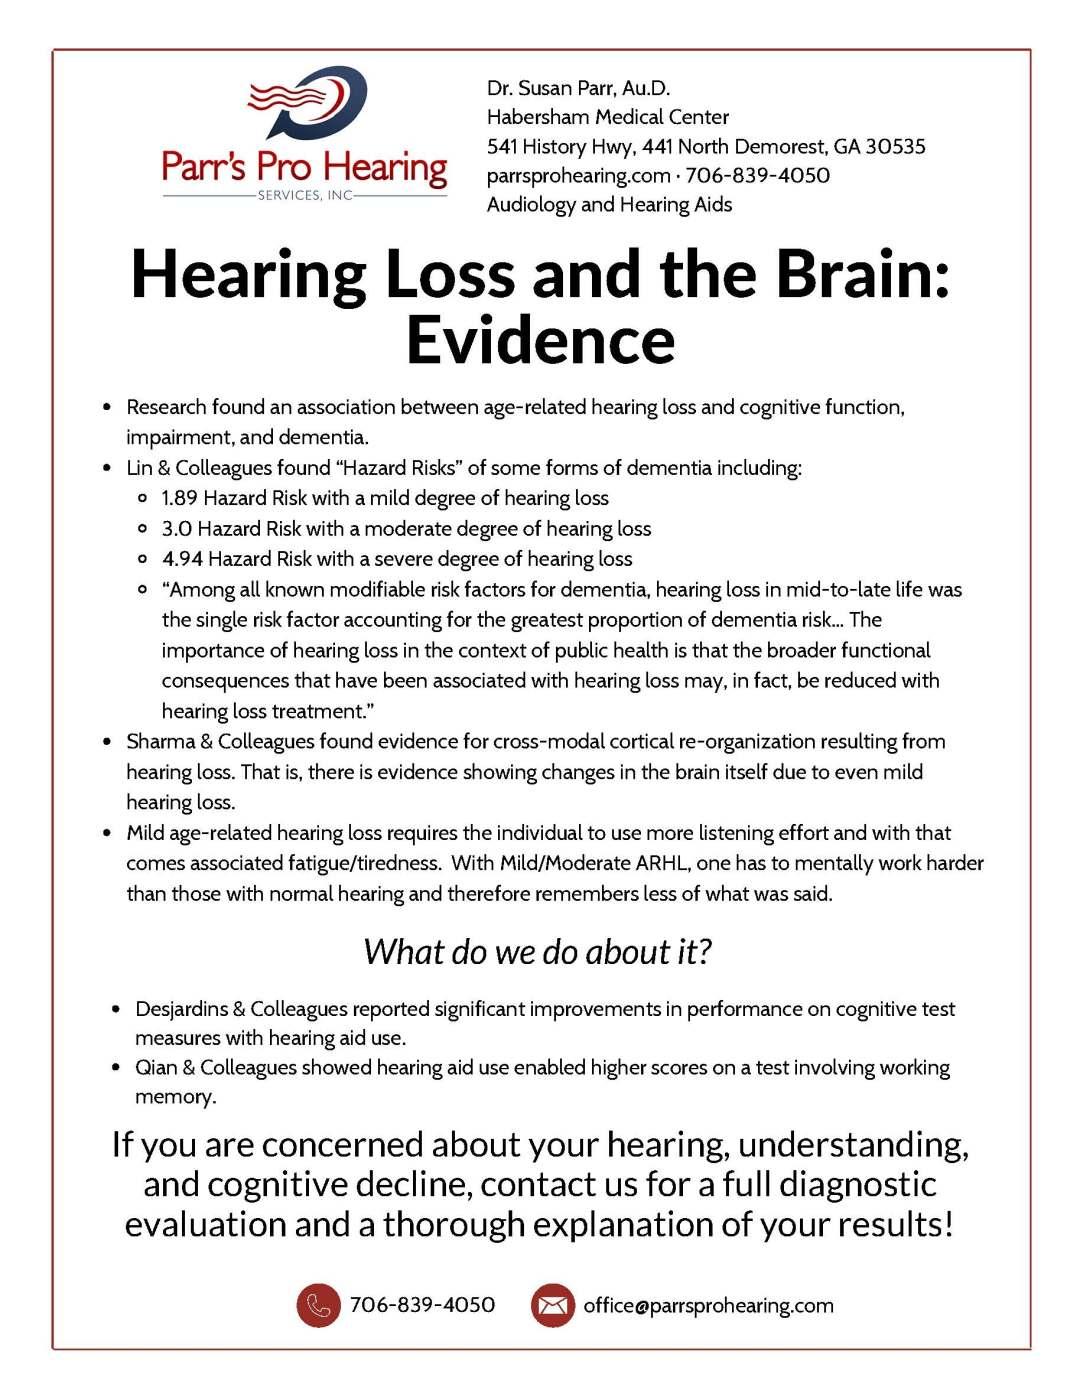 Hearing Loss and the Brain printable